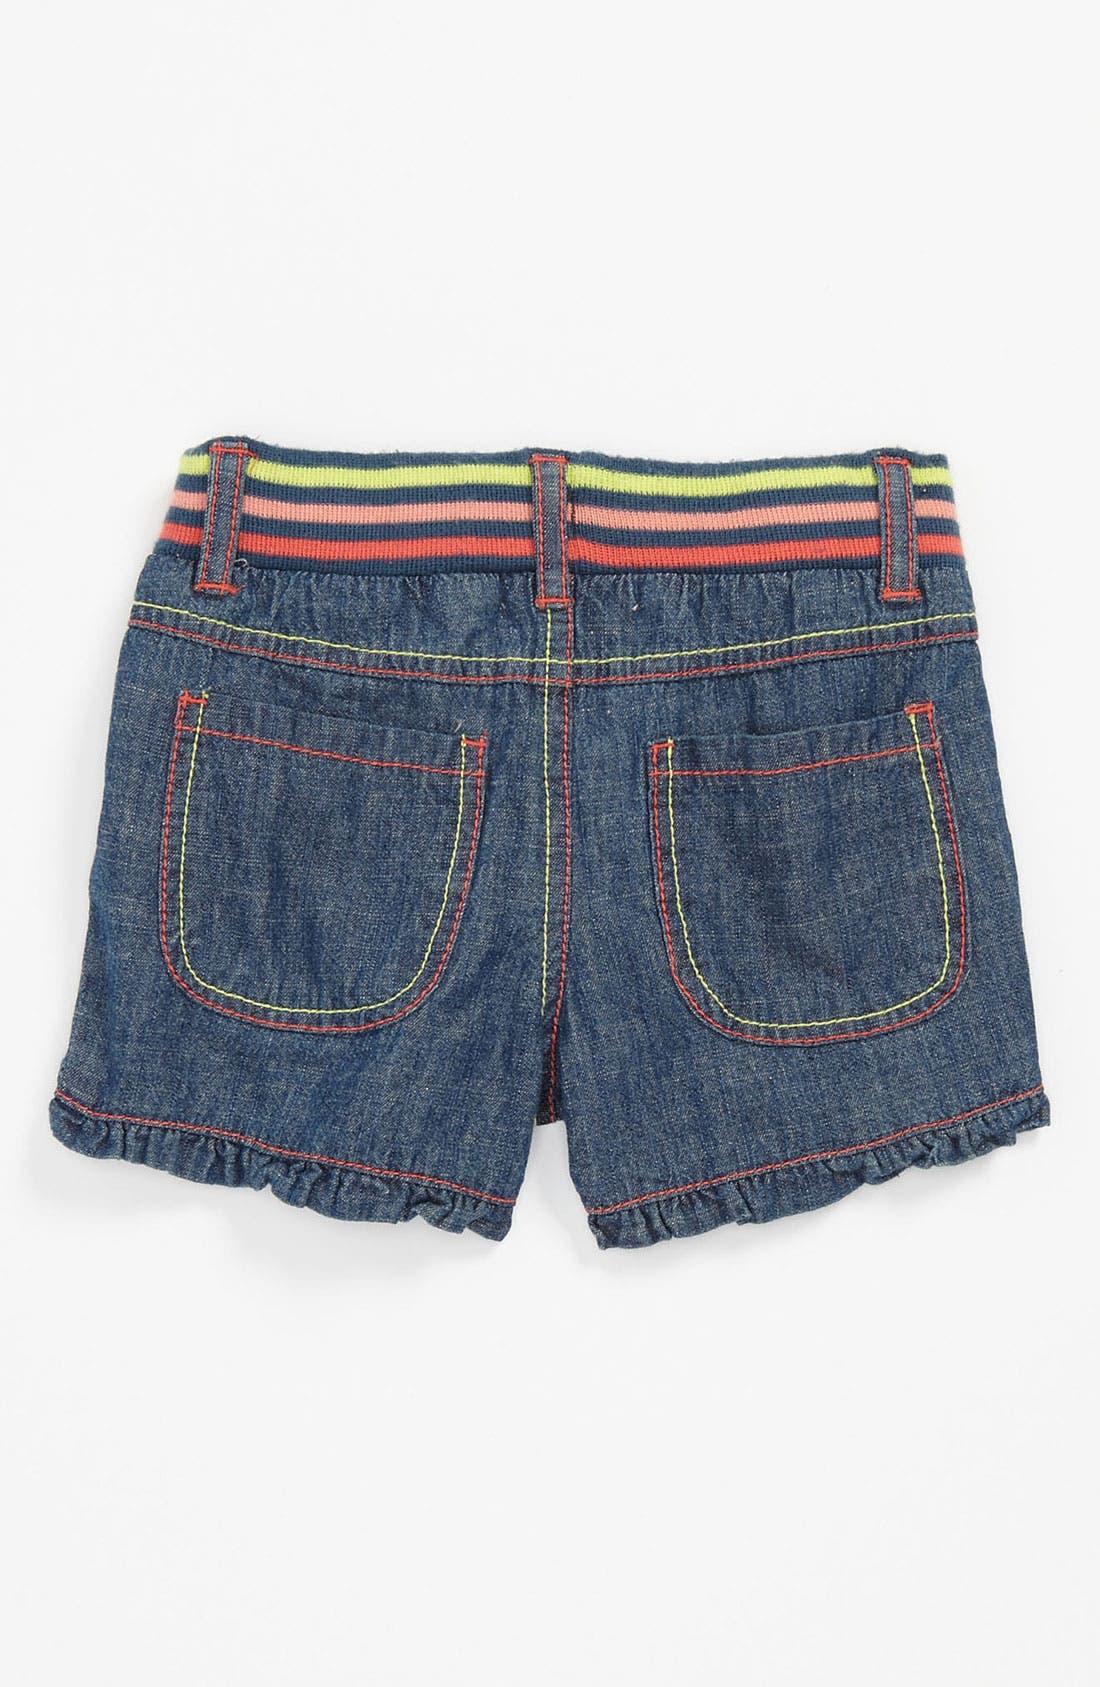 Alternate Image 1 Selected - Pumpkin Patch Denim Shorts (Baby)